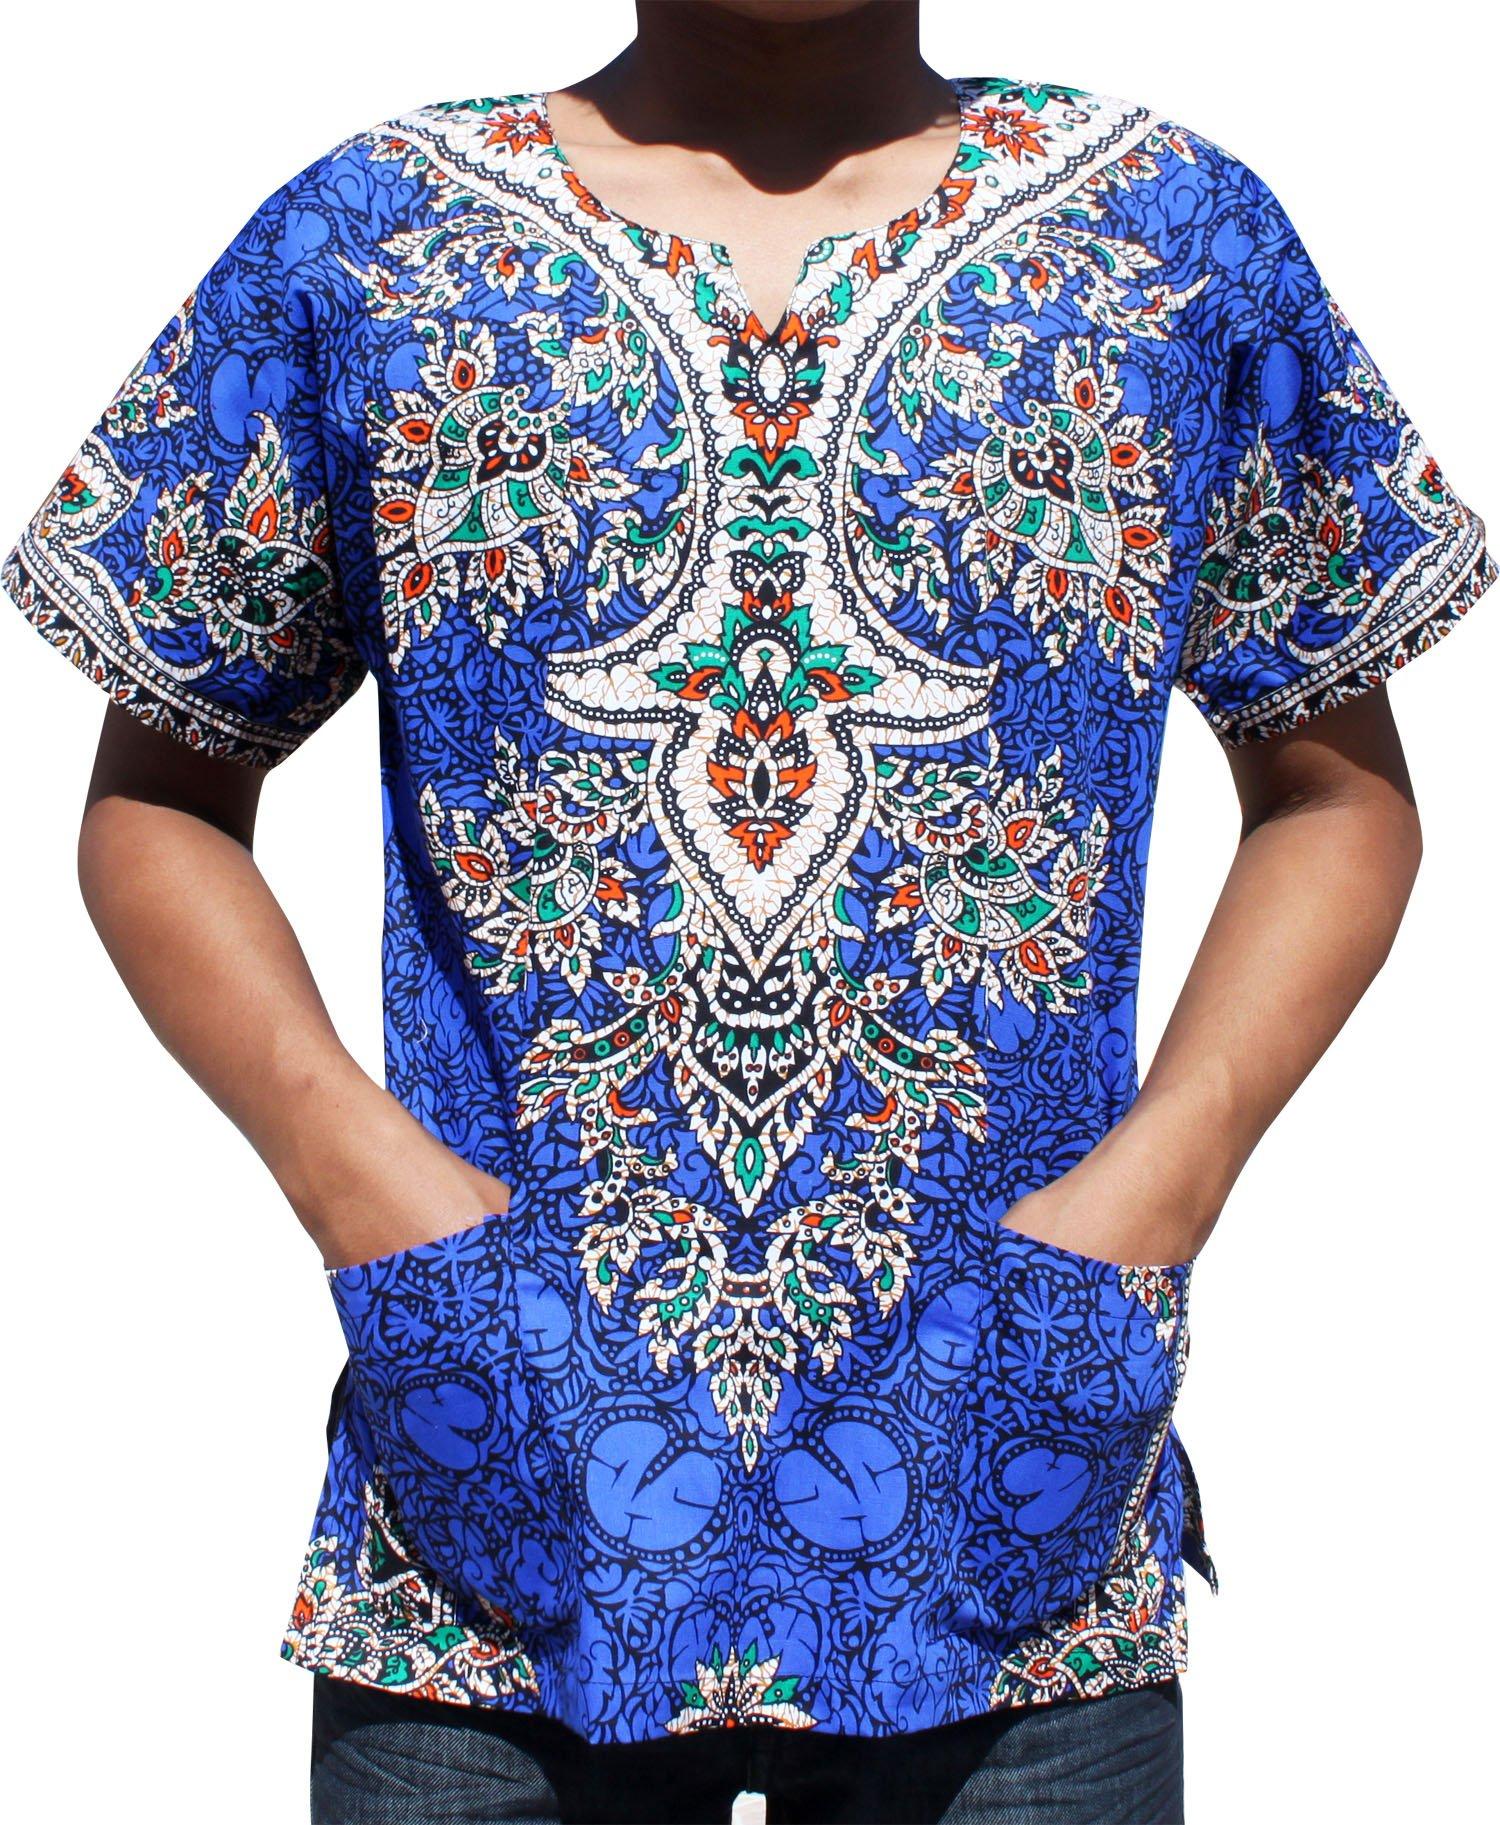 RaanPahMuang Unisex Dashiki Shirt African Freedom Short Sleeve Vibrant Colors, Small, Zaffre Blue